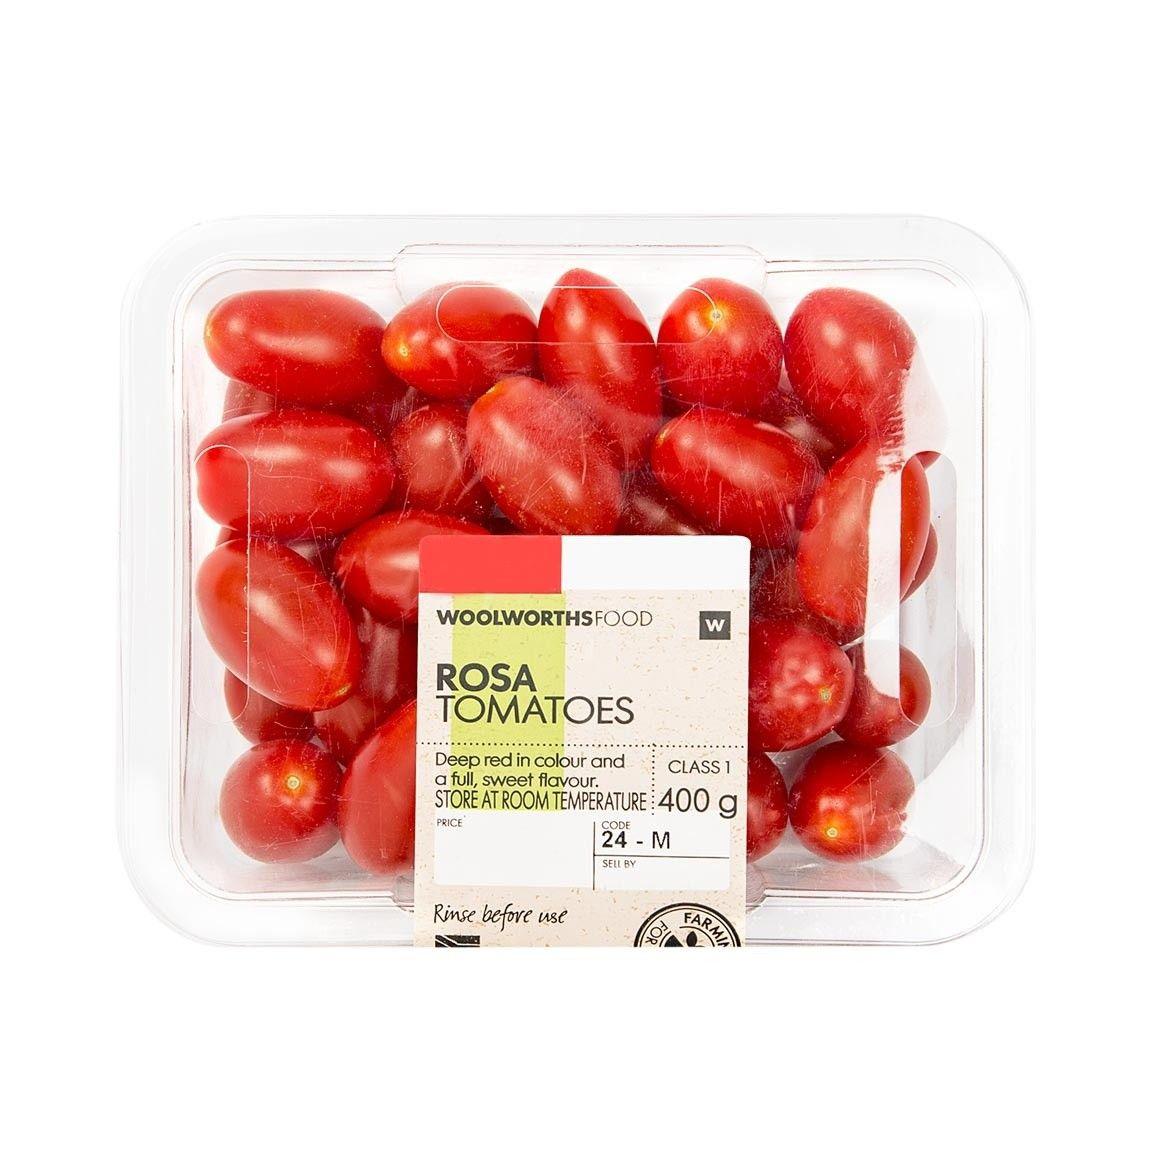 Rosa Tomatoes 400g Food Woolworths Food Tomato